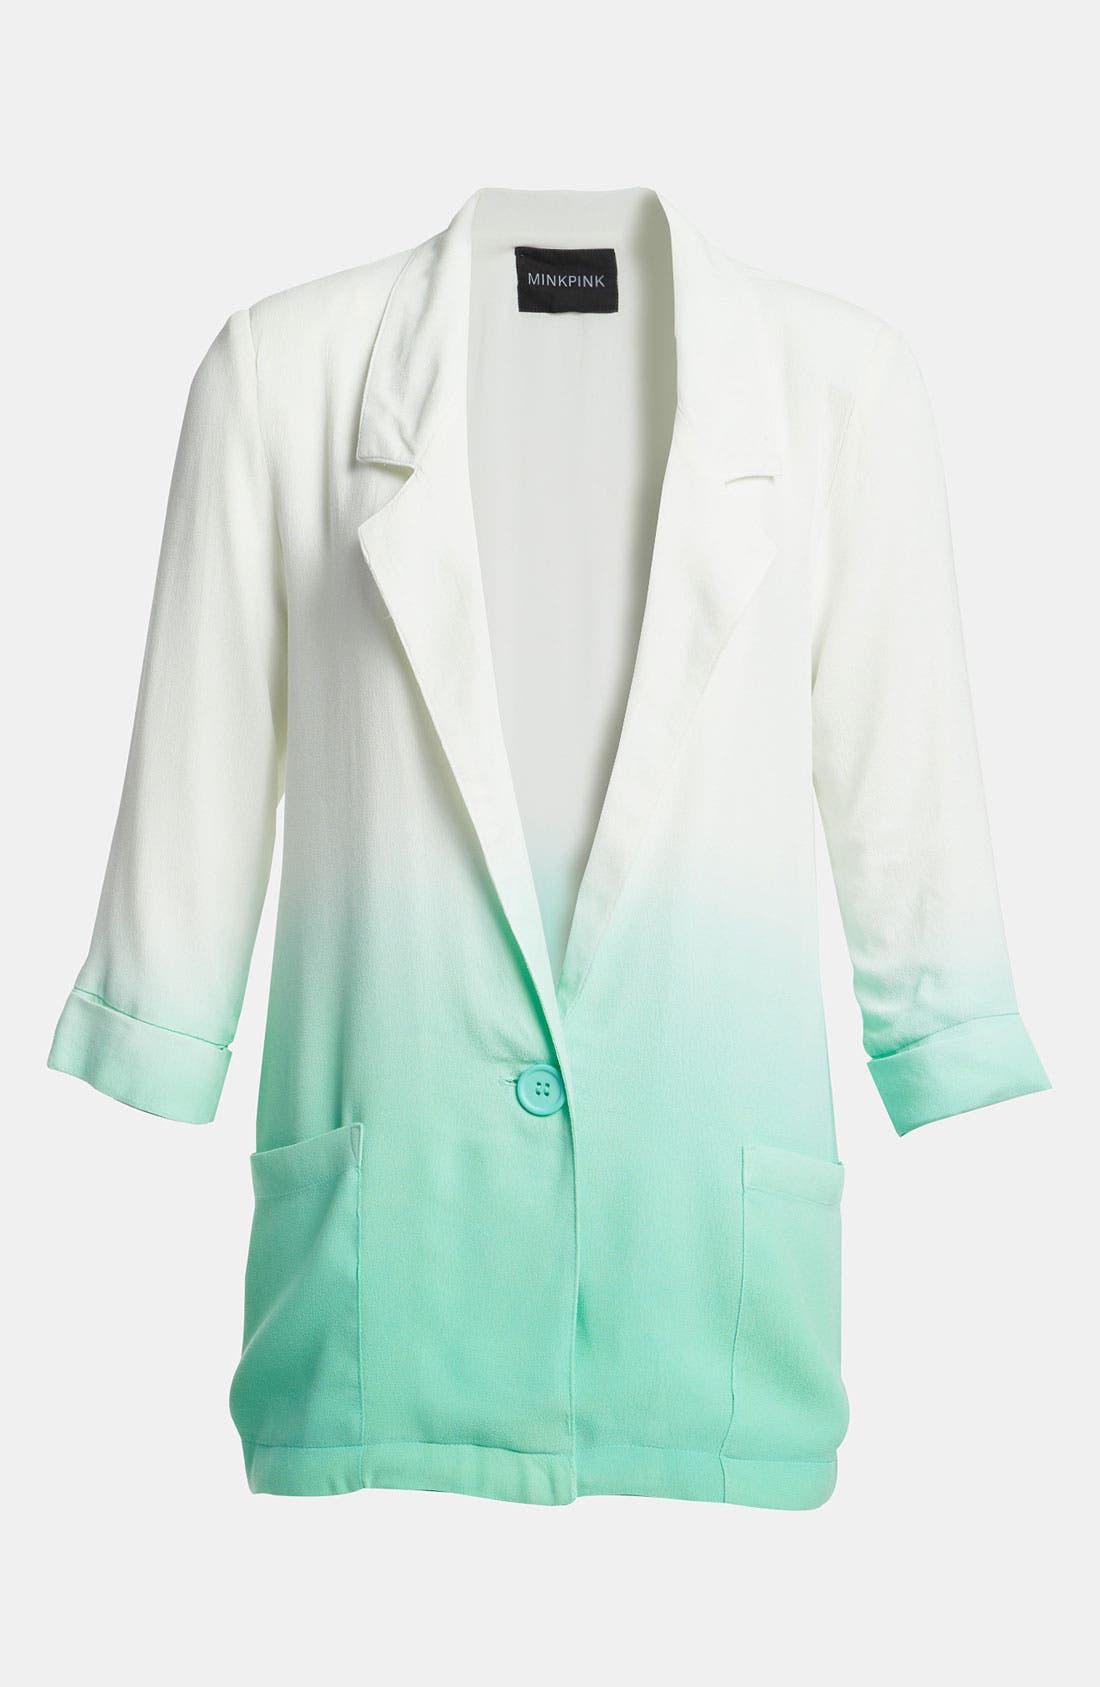 Main Image - MINKPINK 'Great White' Dip Dye Blazer